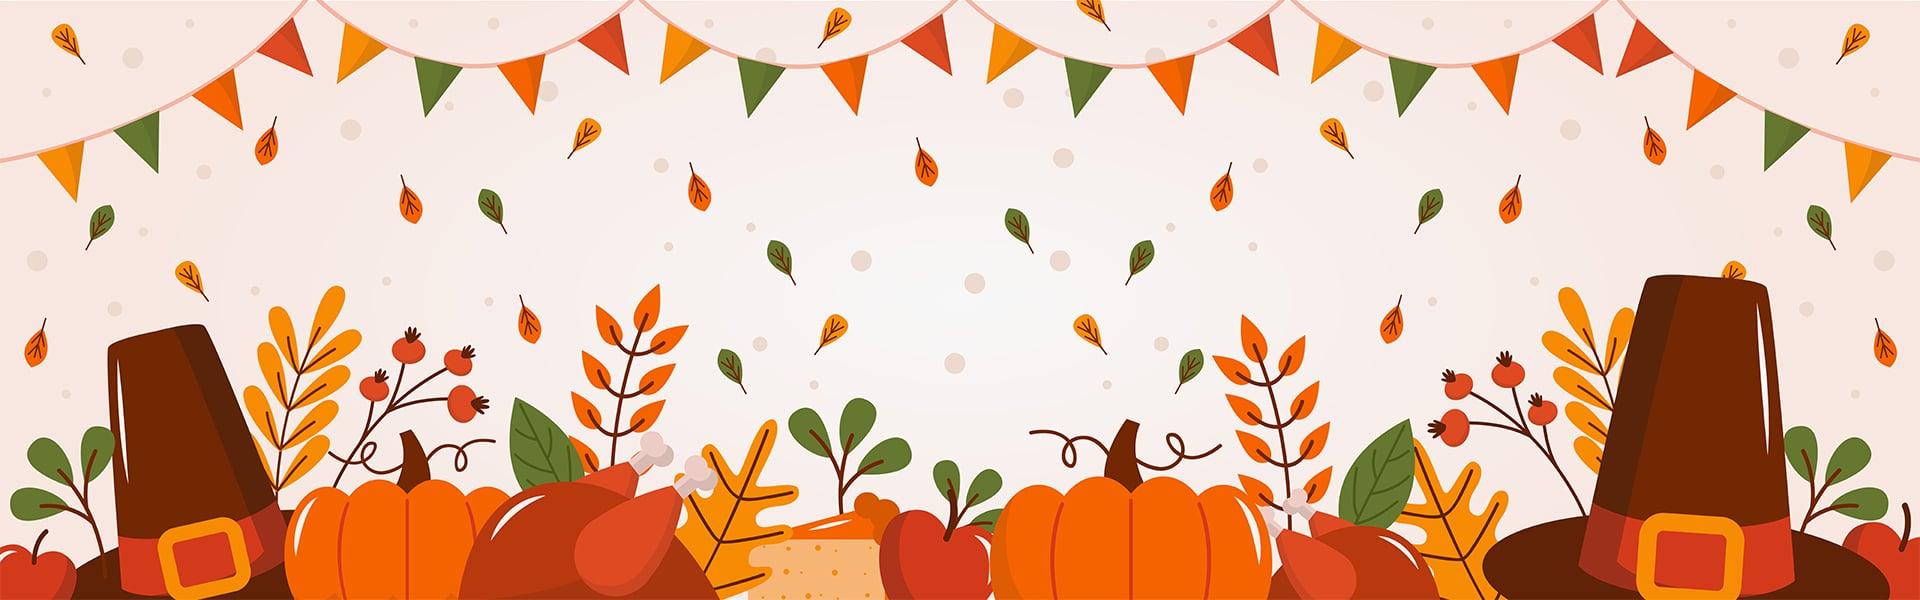 List of Important Days in November: National and International Days List 2020 Festival Calendar